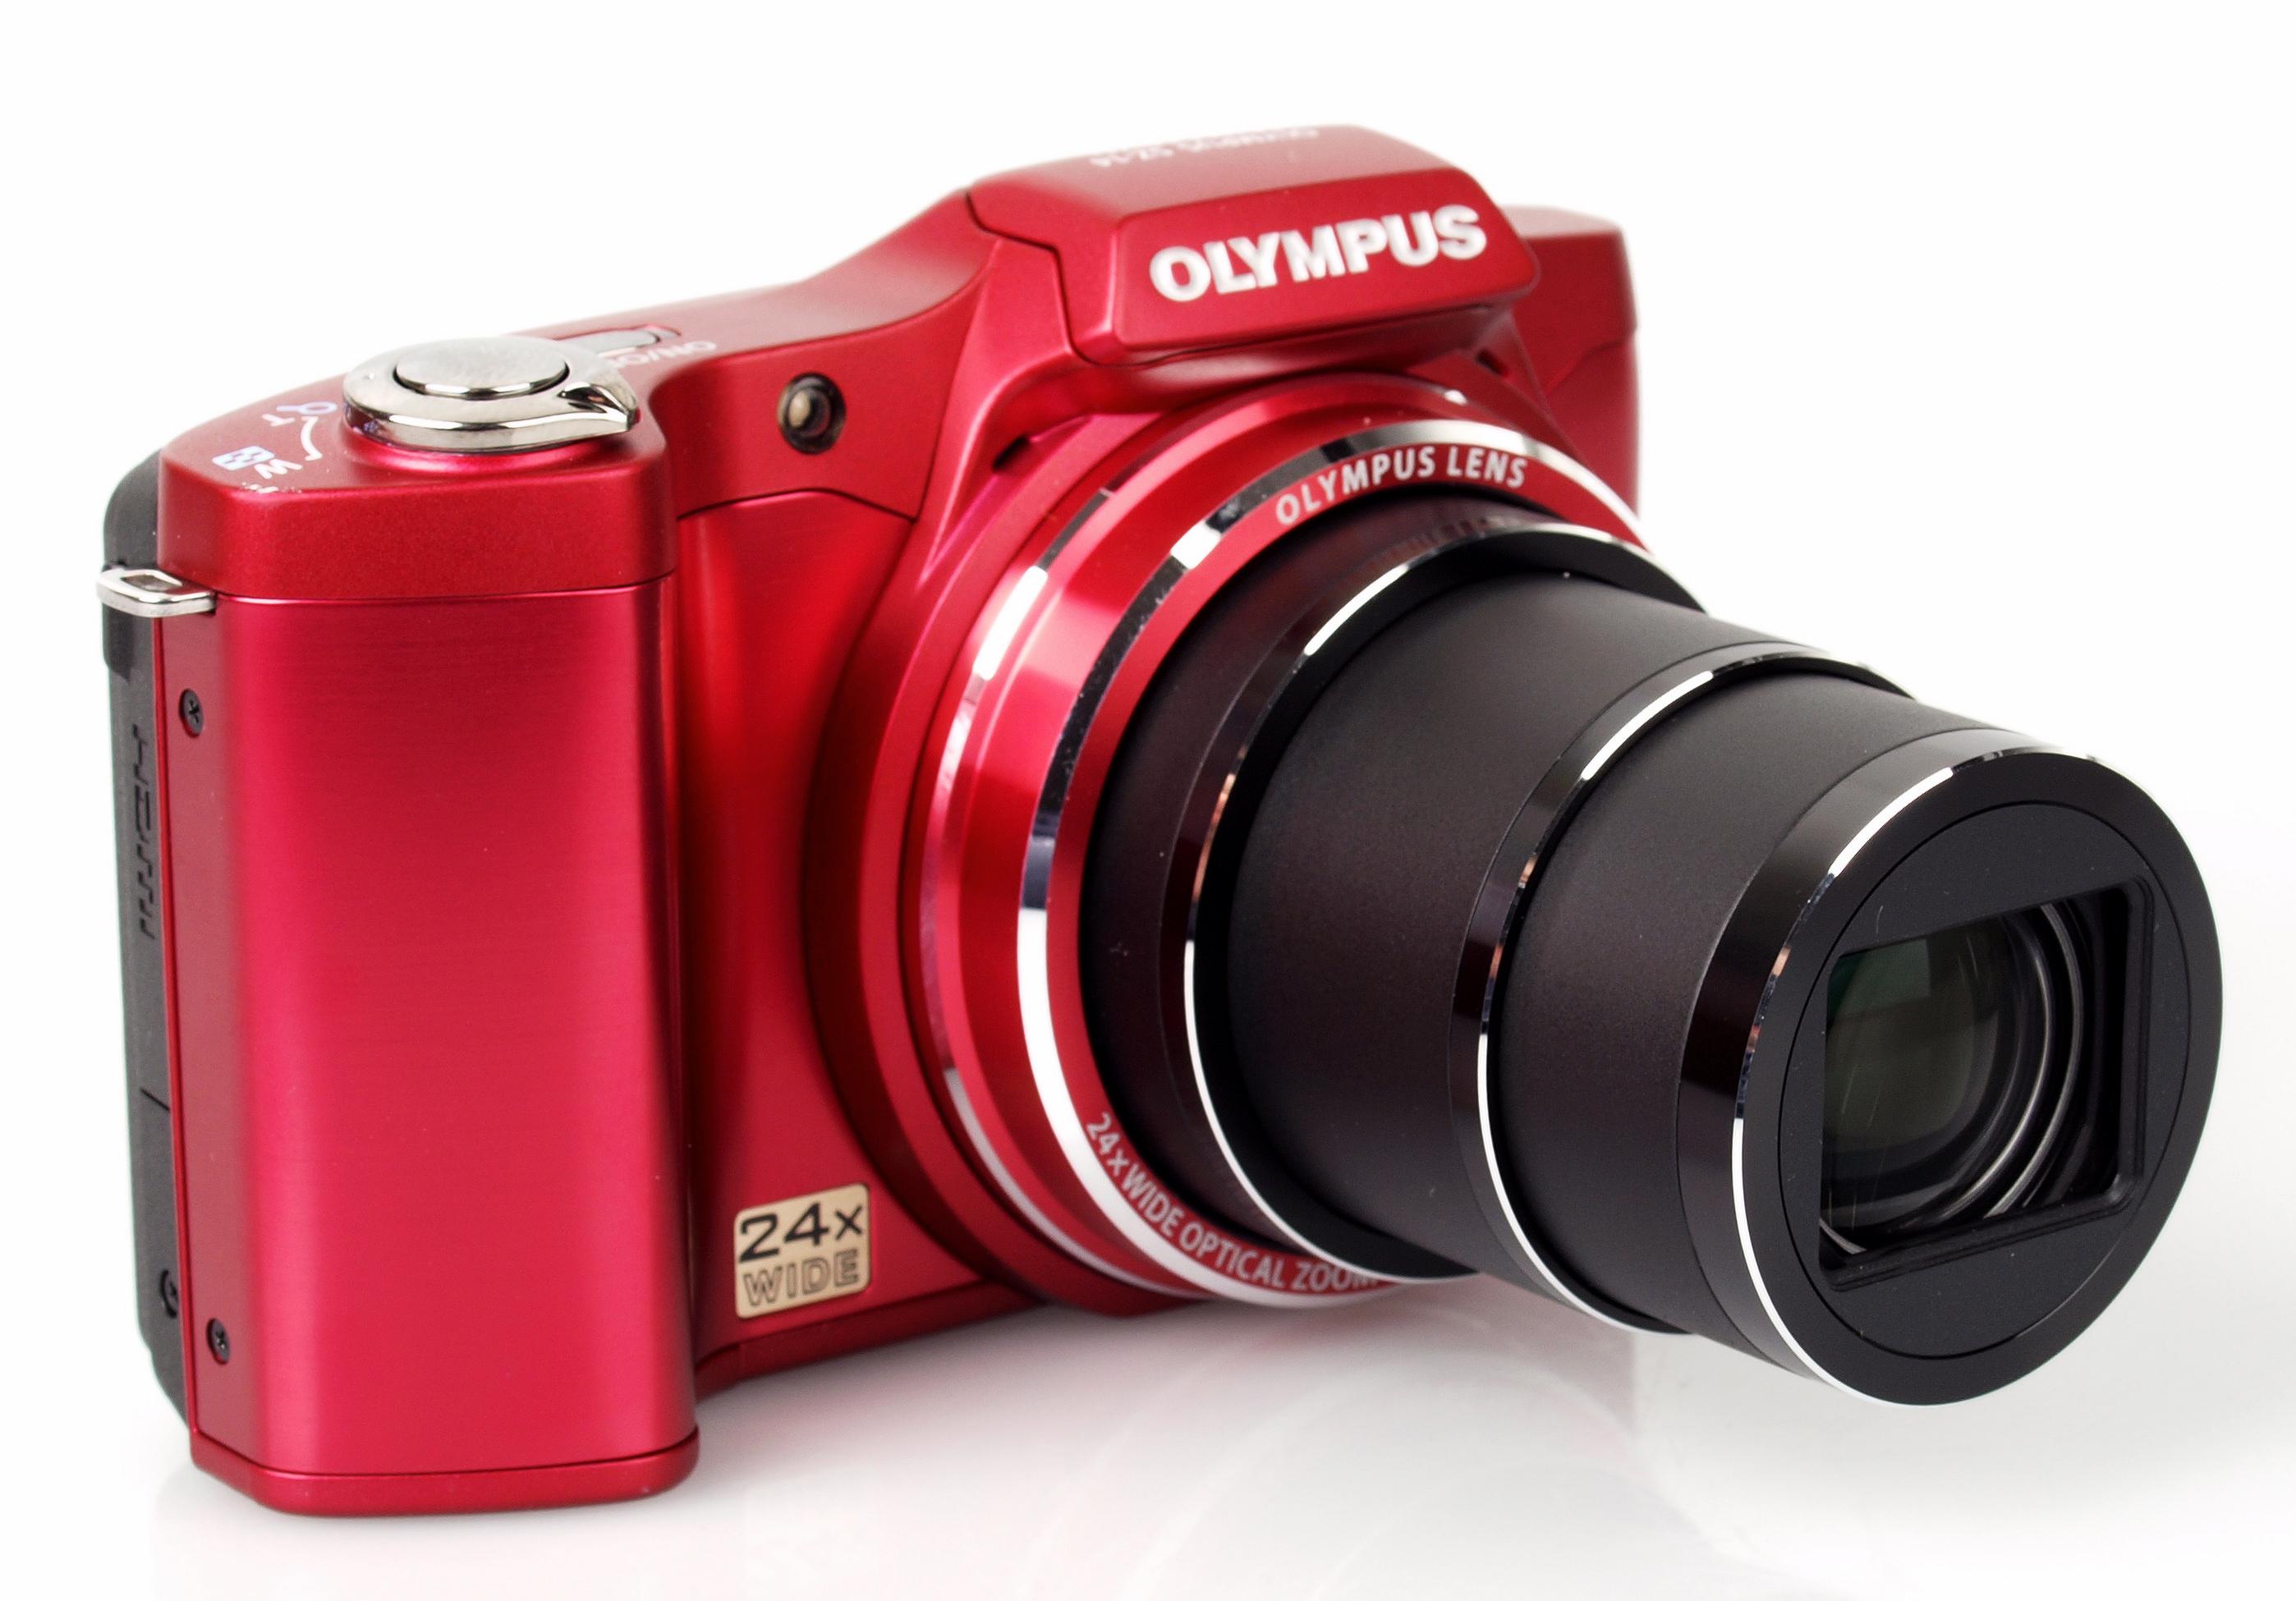 olympus sz 14 compact digital camera review rh ephotozine com olympus sz 14 manual focus olympus sz 14 mode d'emploi